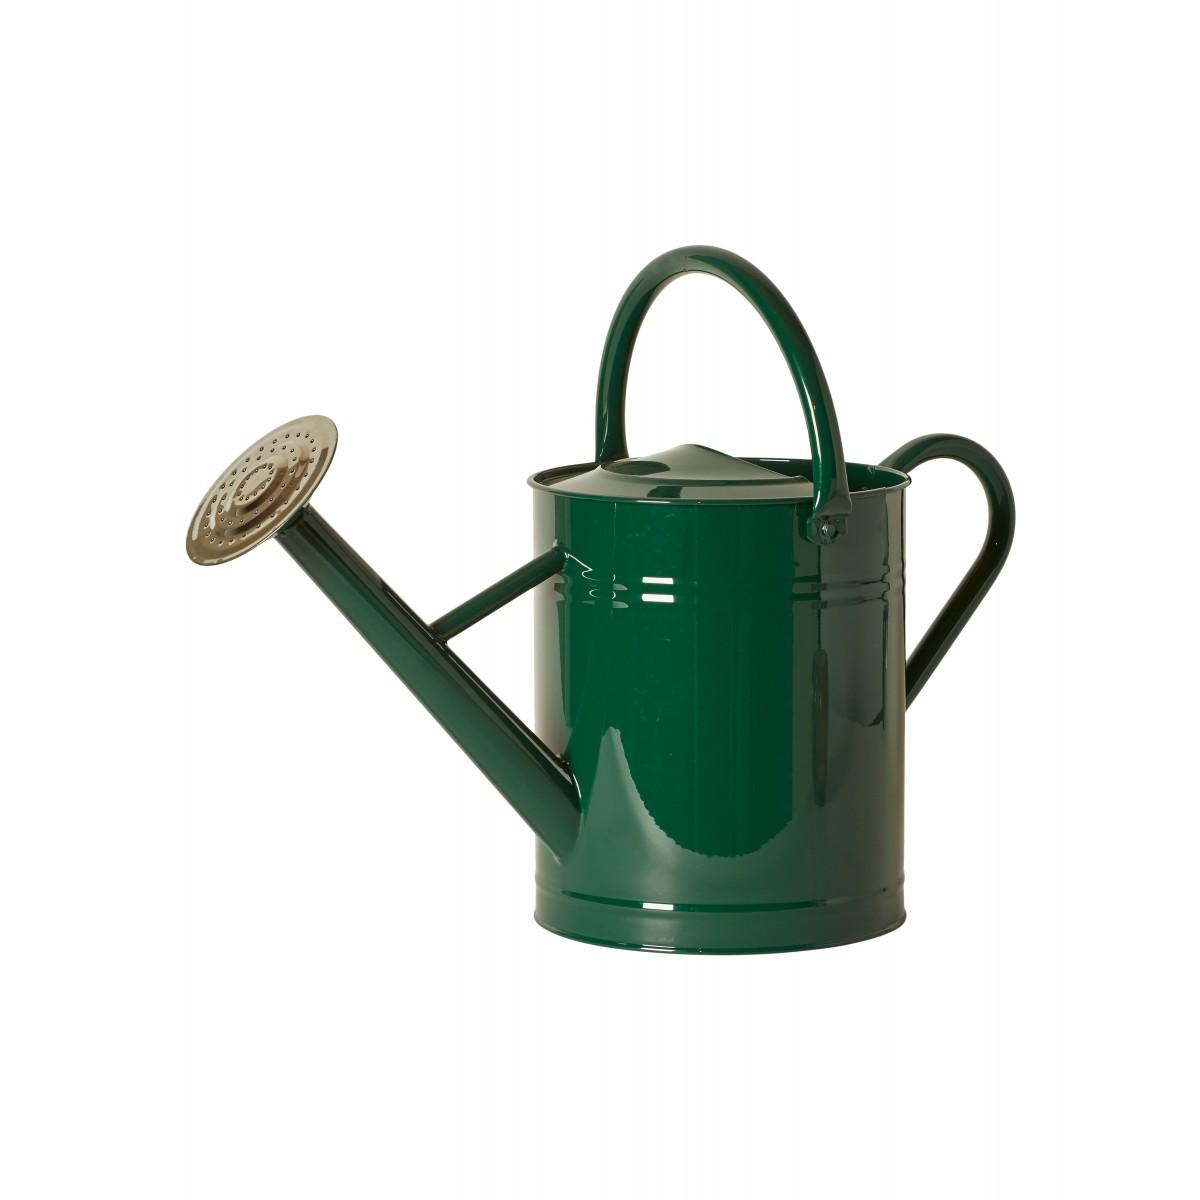 DACORE Vandkande 8 ltr grøn